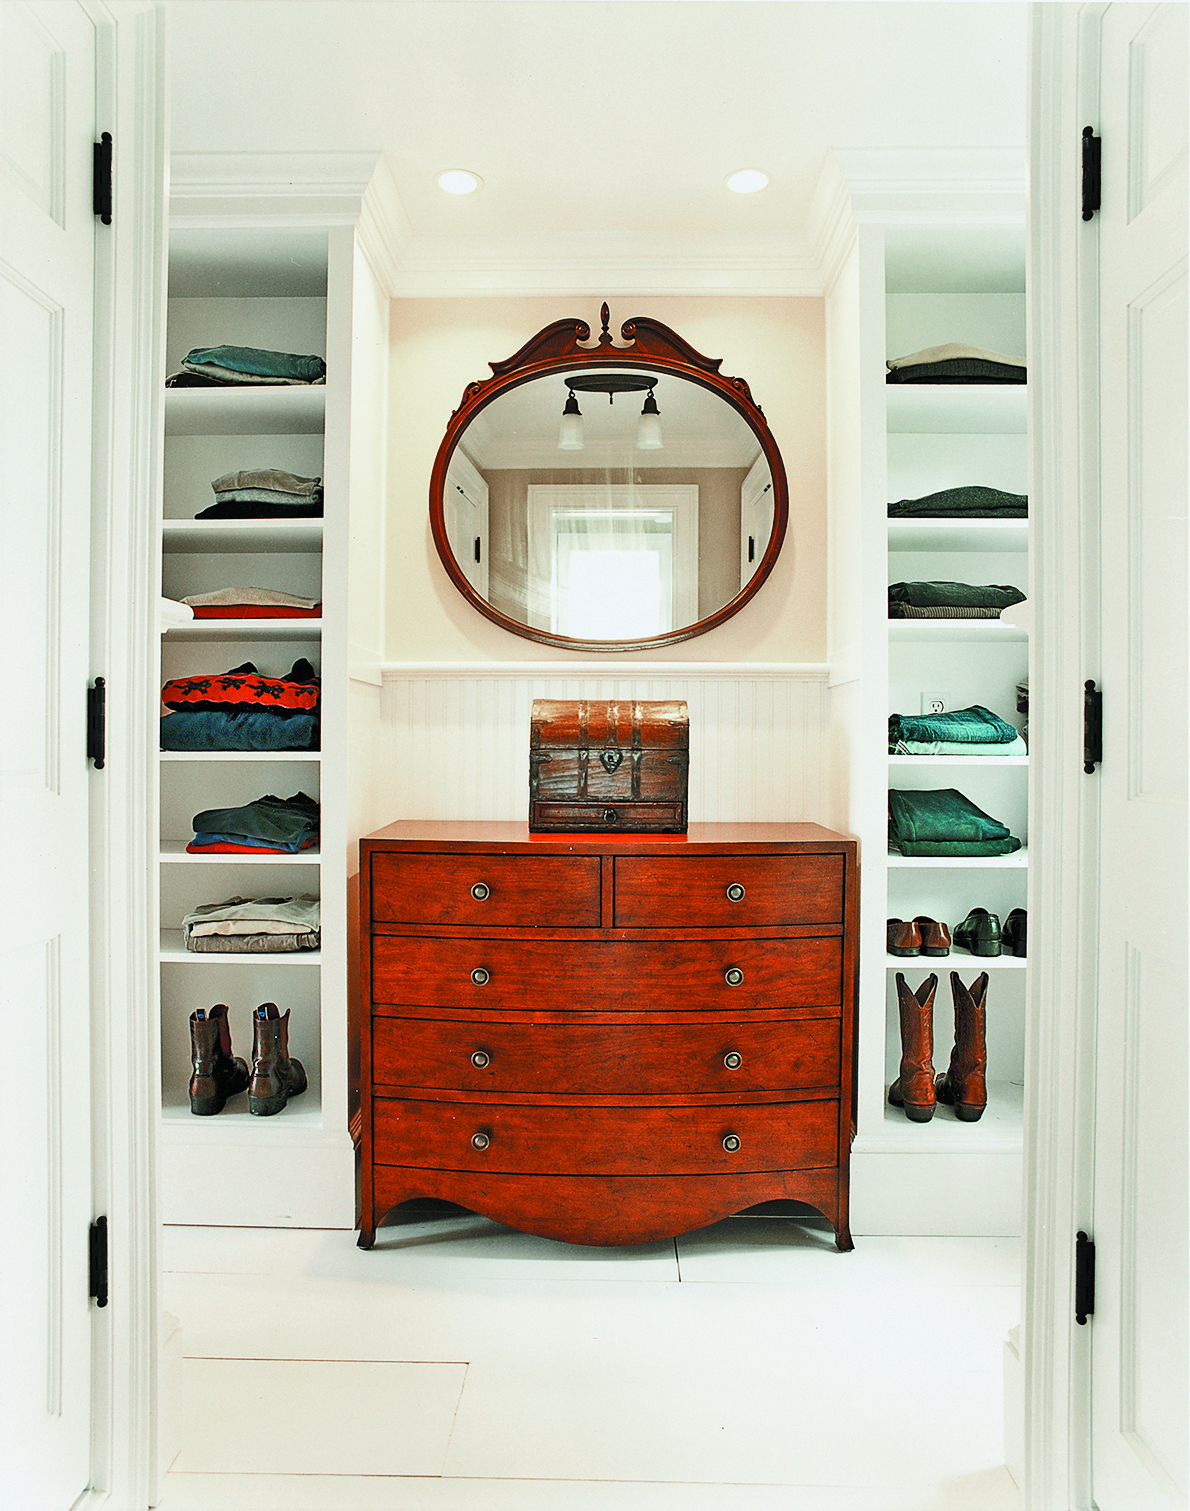 Builtin Storage Ideas Build a closet, Master bedroom